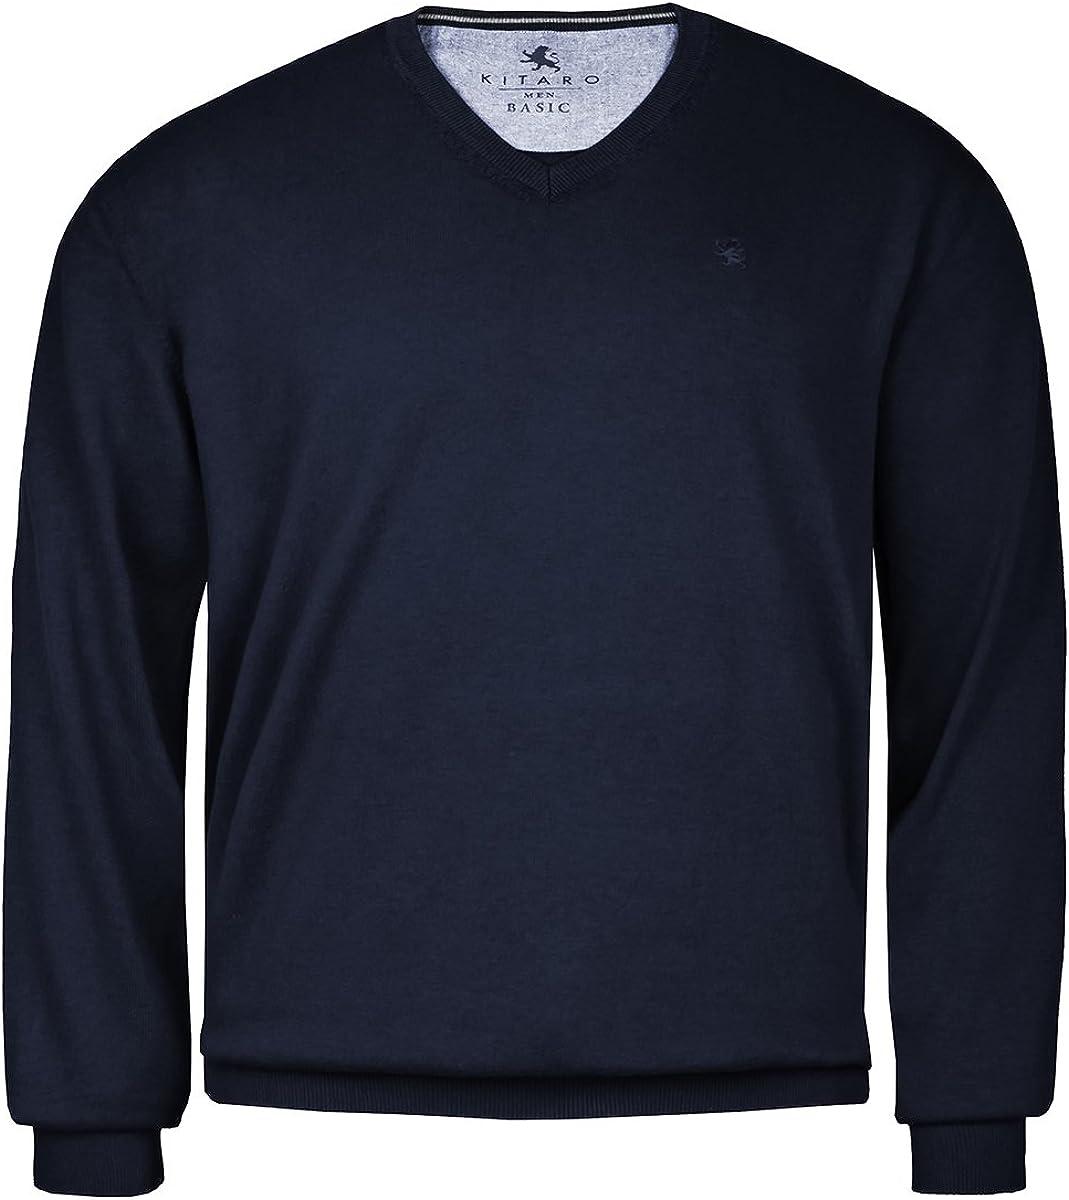 Kitaro Pullover Sweater Fine Knit Cotton Men/'s Long Sleeve V Neck Basic